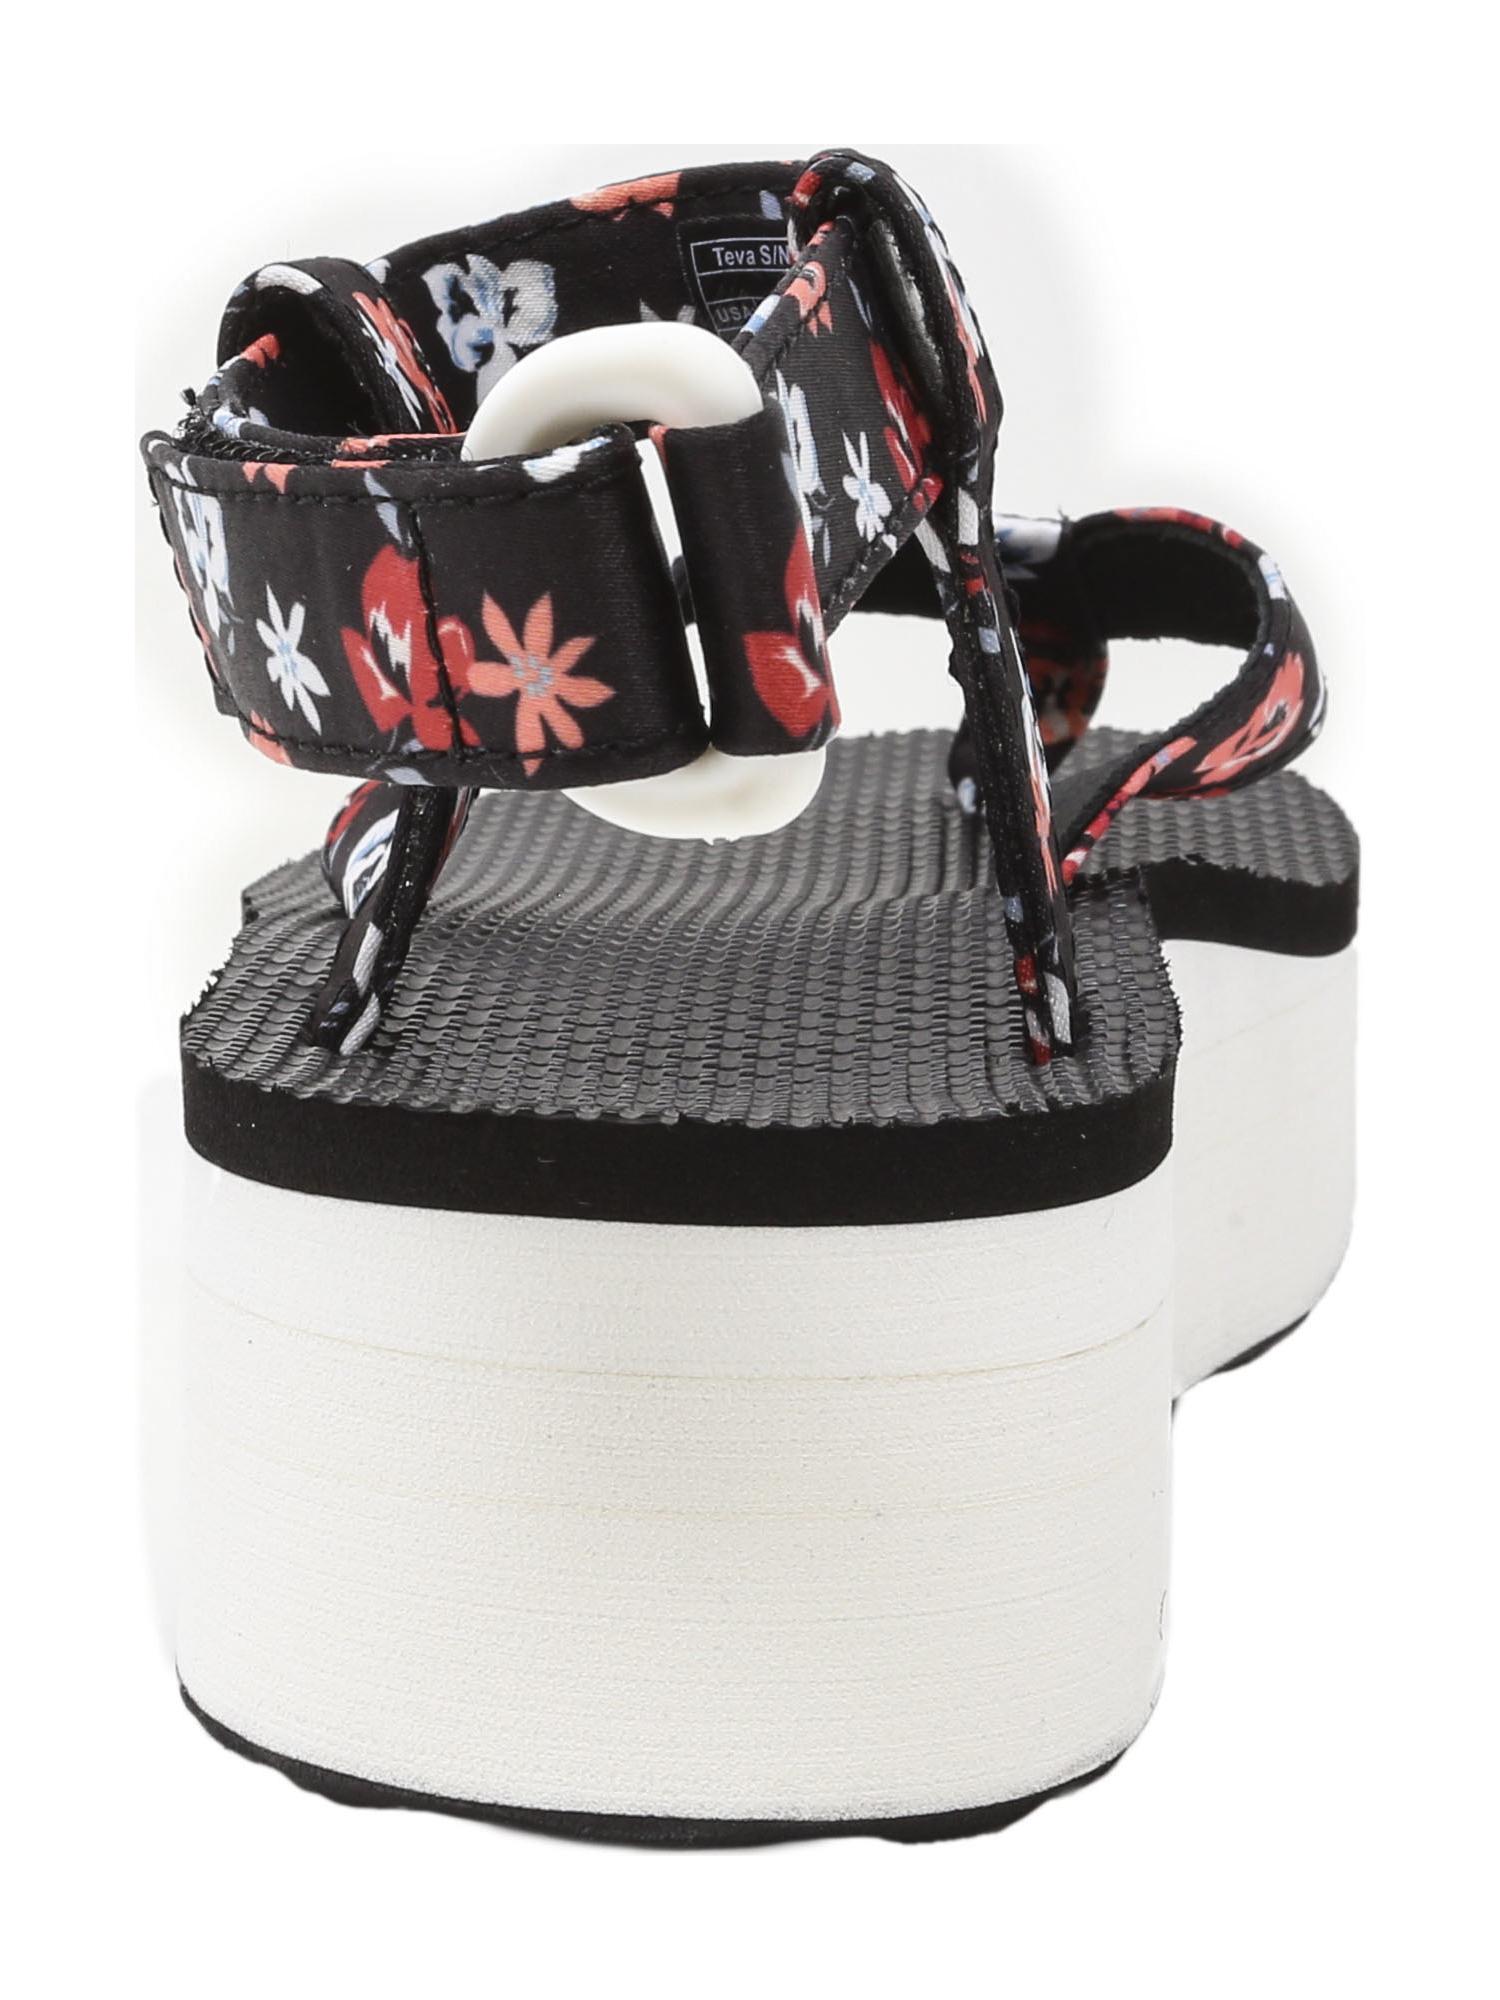 Teva-Women-039-s-Flatform-Sandal-Floral-Ankle-High thumbnail 12